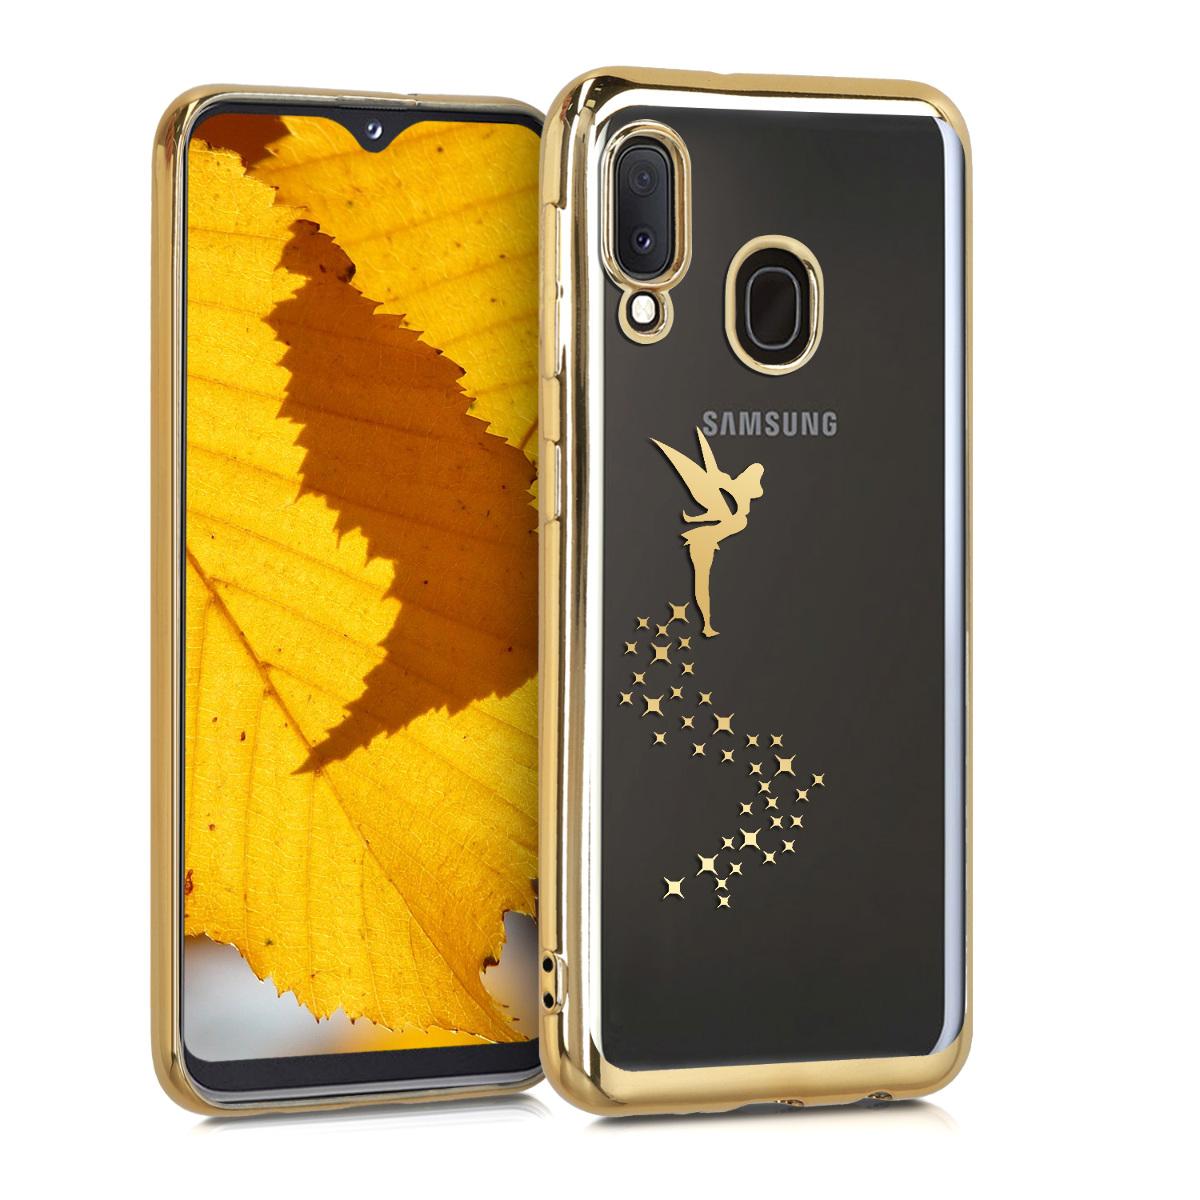 KW Θήκη Σιλικόνης Samsung Galaxy A20e - Gold / Transparent (49541.01)